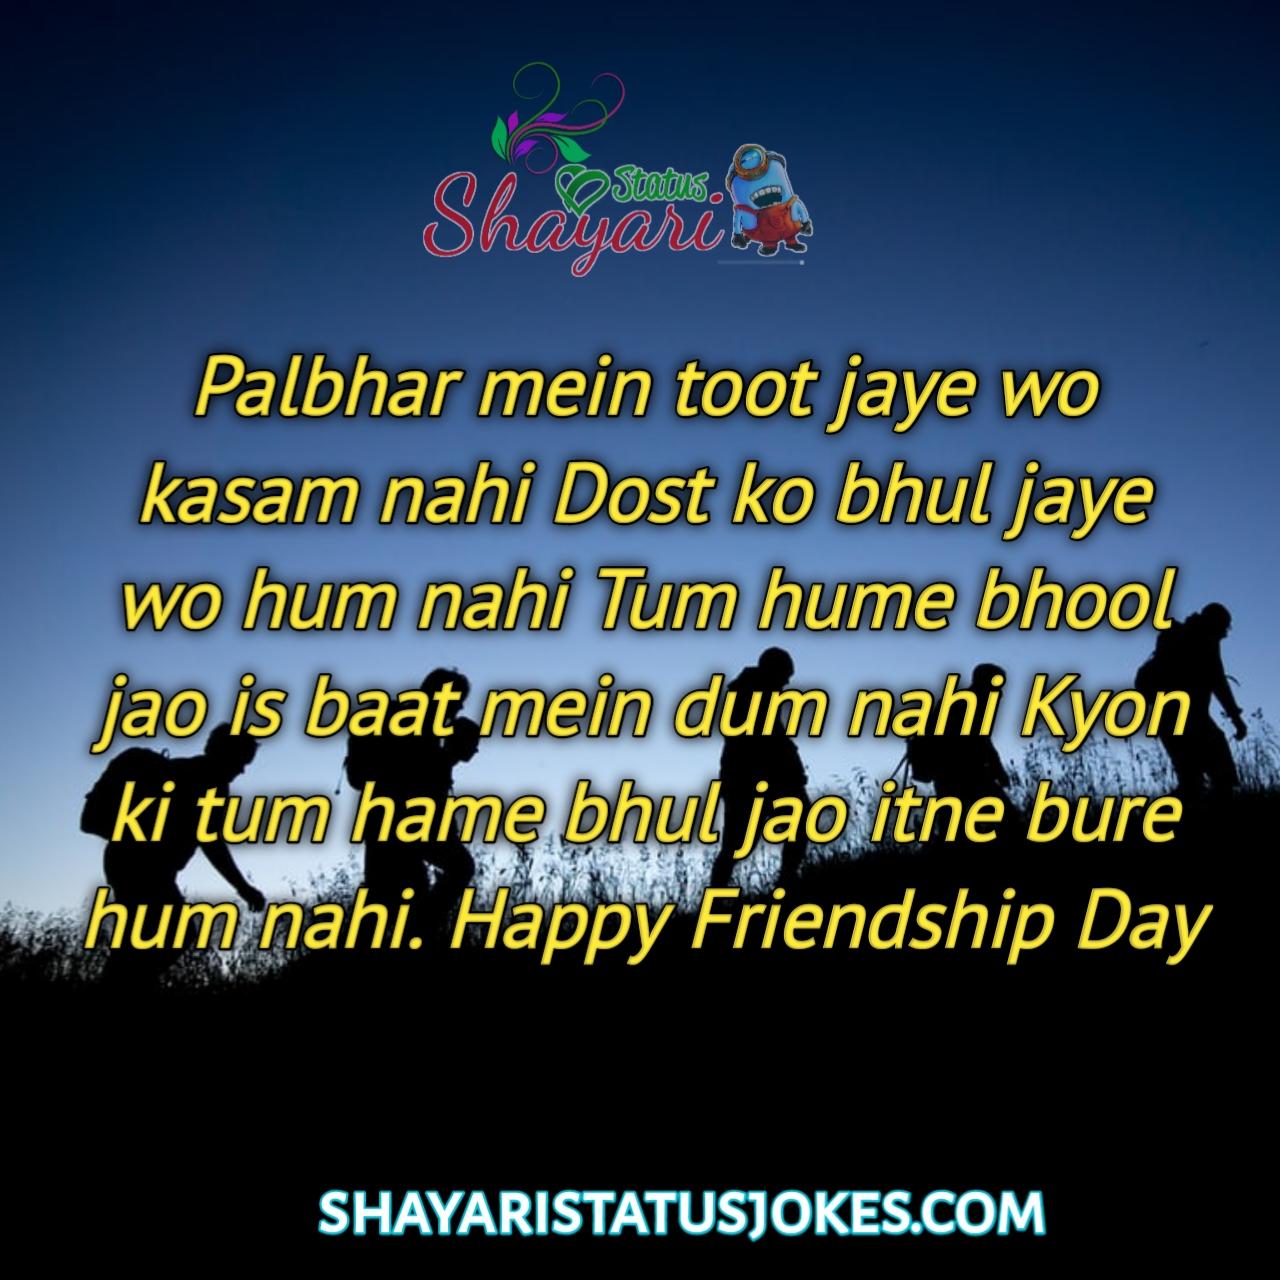 Friendship day shayari in Hindi 2021Friendship Day Shayari 2021,Happy Friendship Day Shayari 2021 In Hindi, फ्रेंडशिप डे शायरी, Friendship Day Shayari In Hindi, happy friendship day Shayari, friendship day quotes in Hindi, friendship day Shayari images.